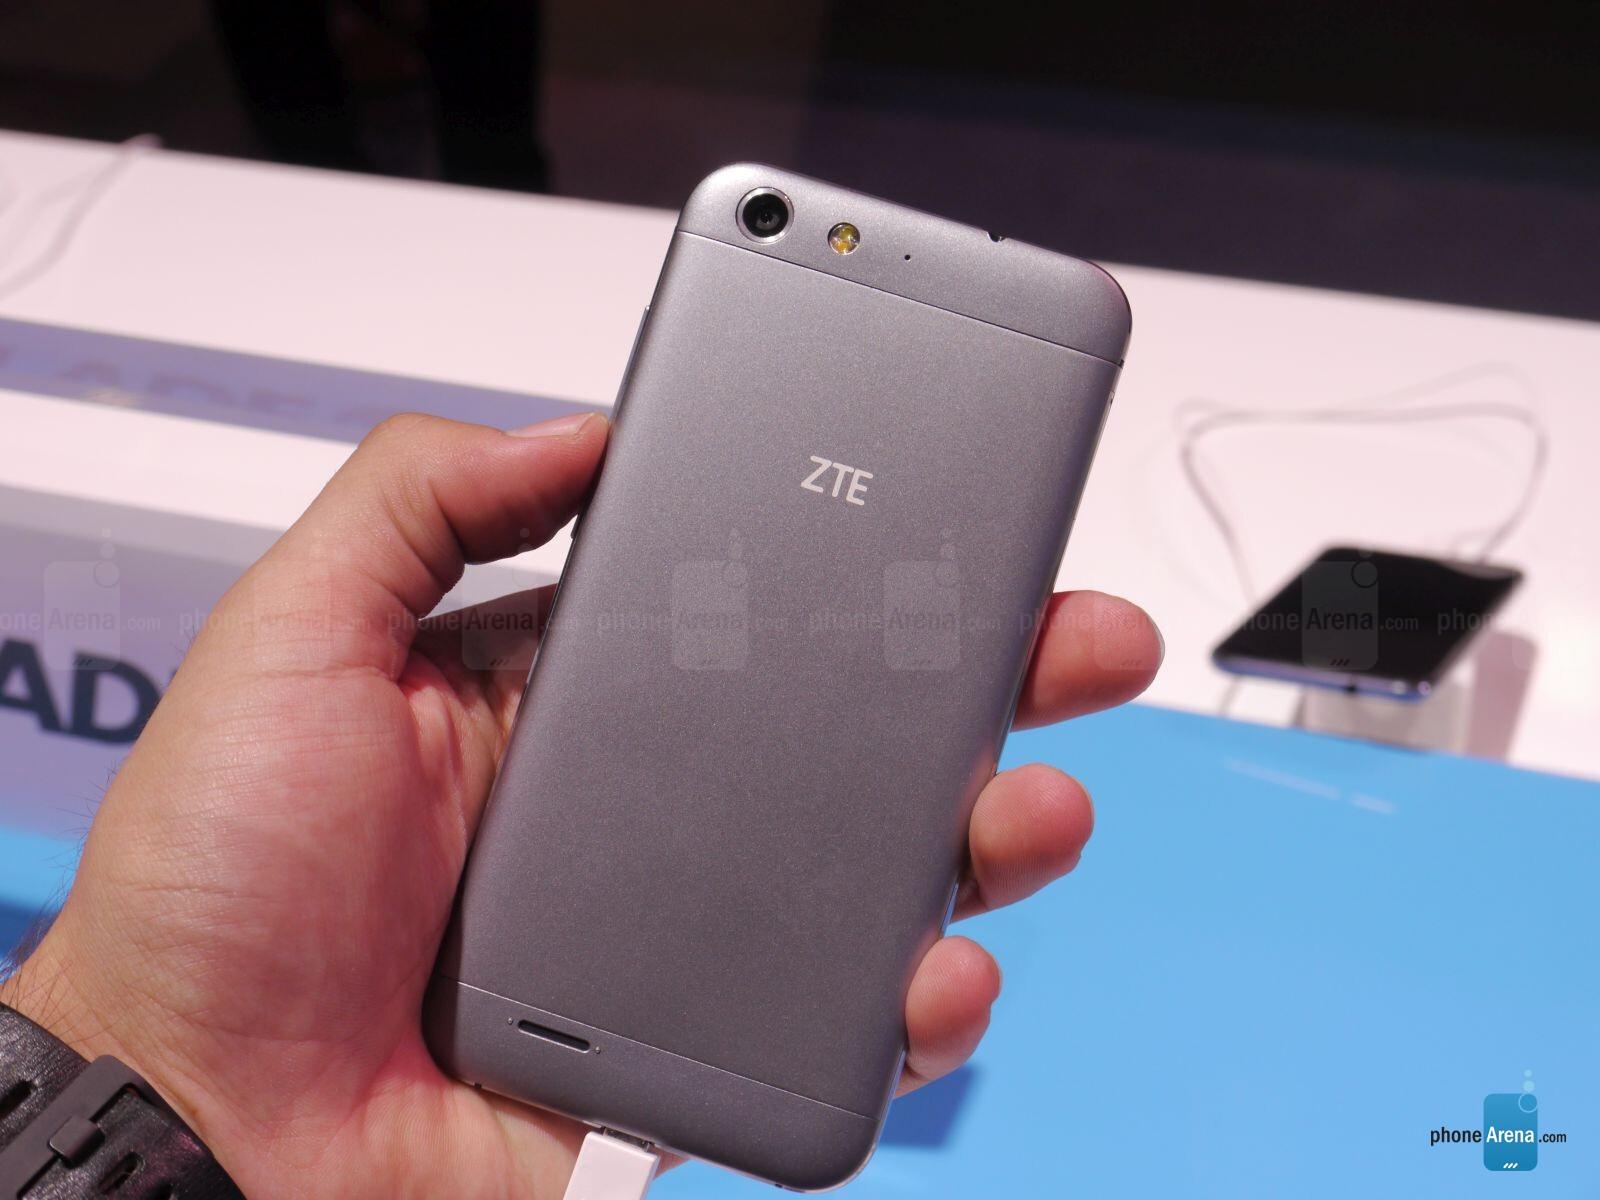 zte v6 camera you want